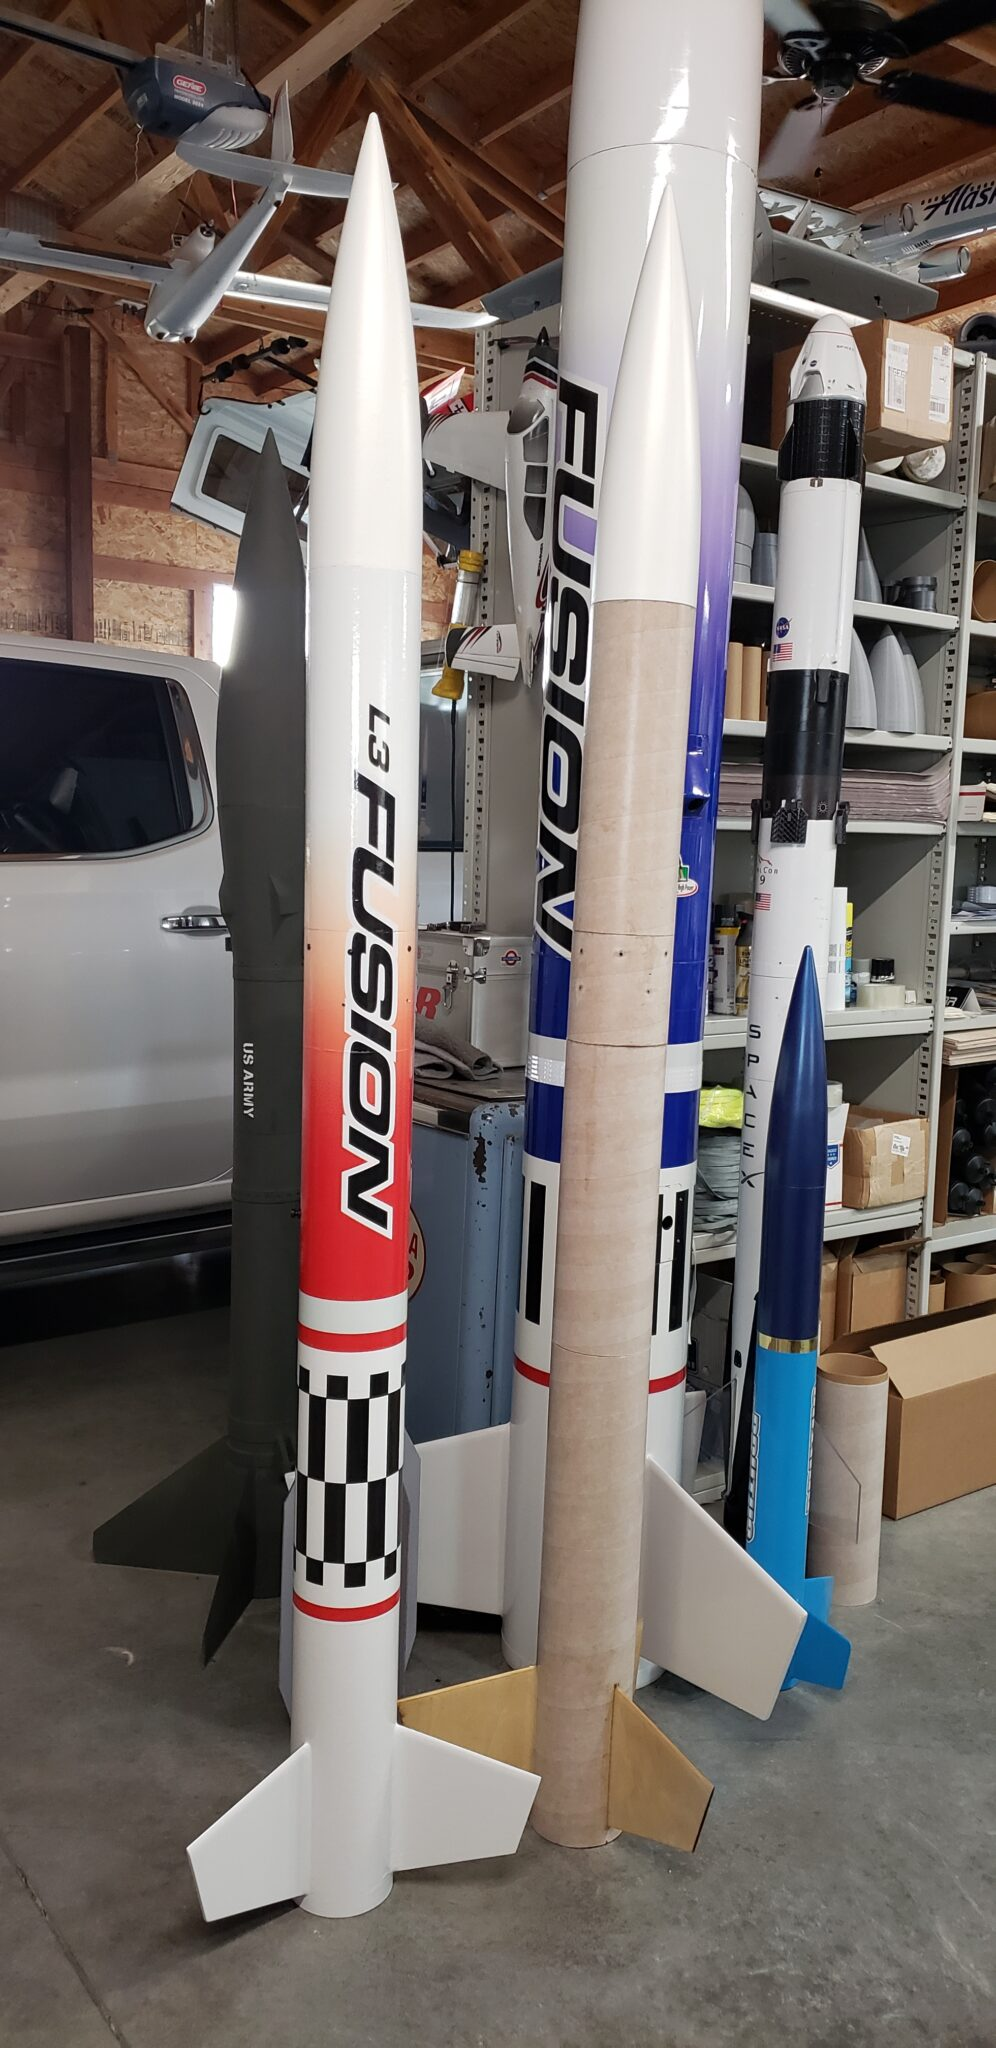 "SBR 5.5"" L3 Fusion High Power Rocket Kit"